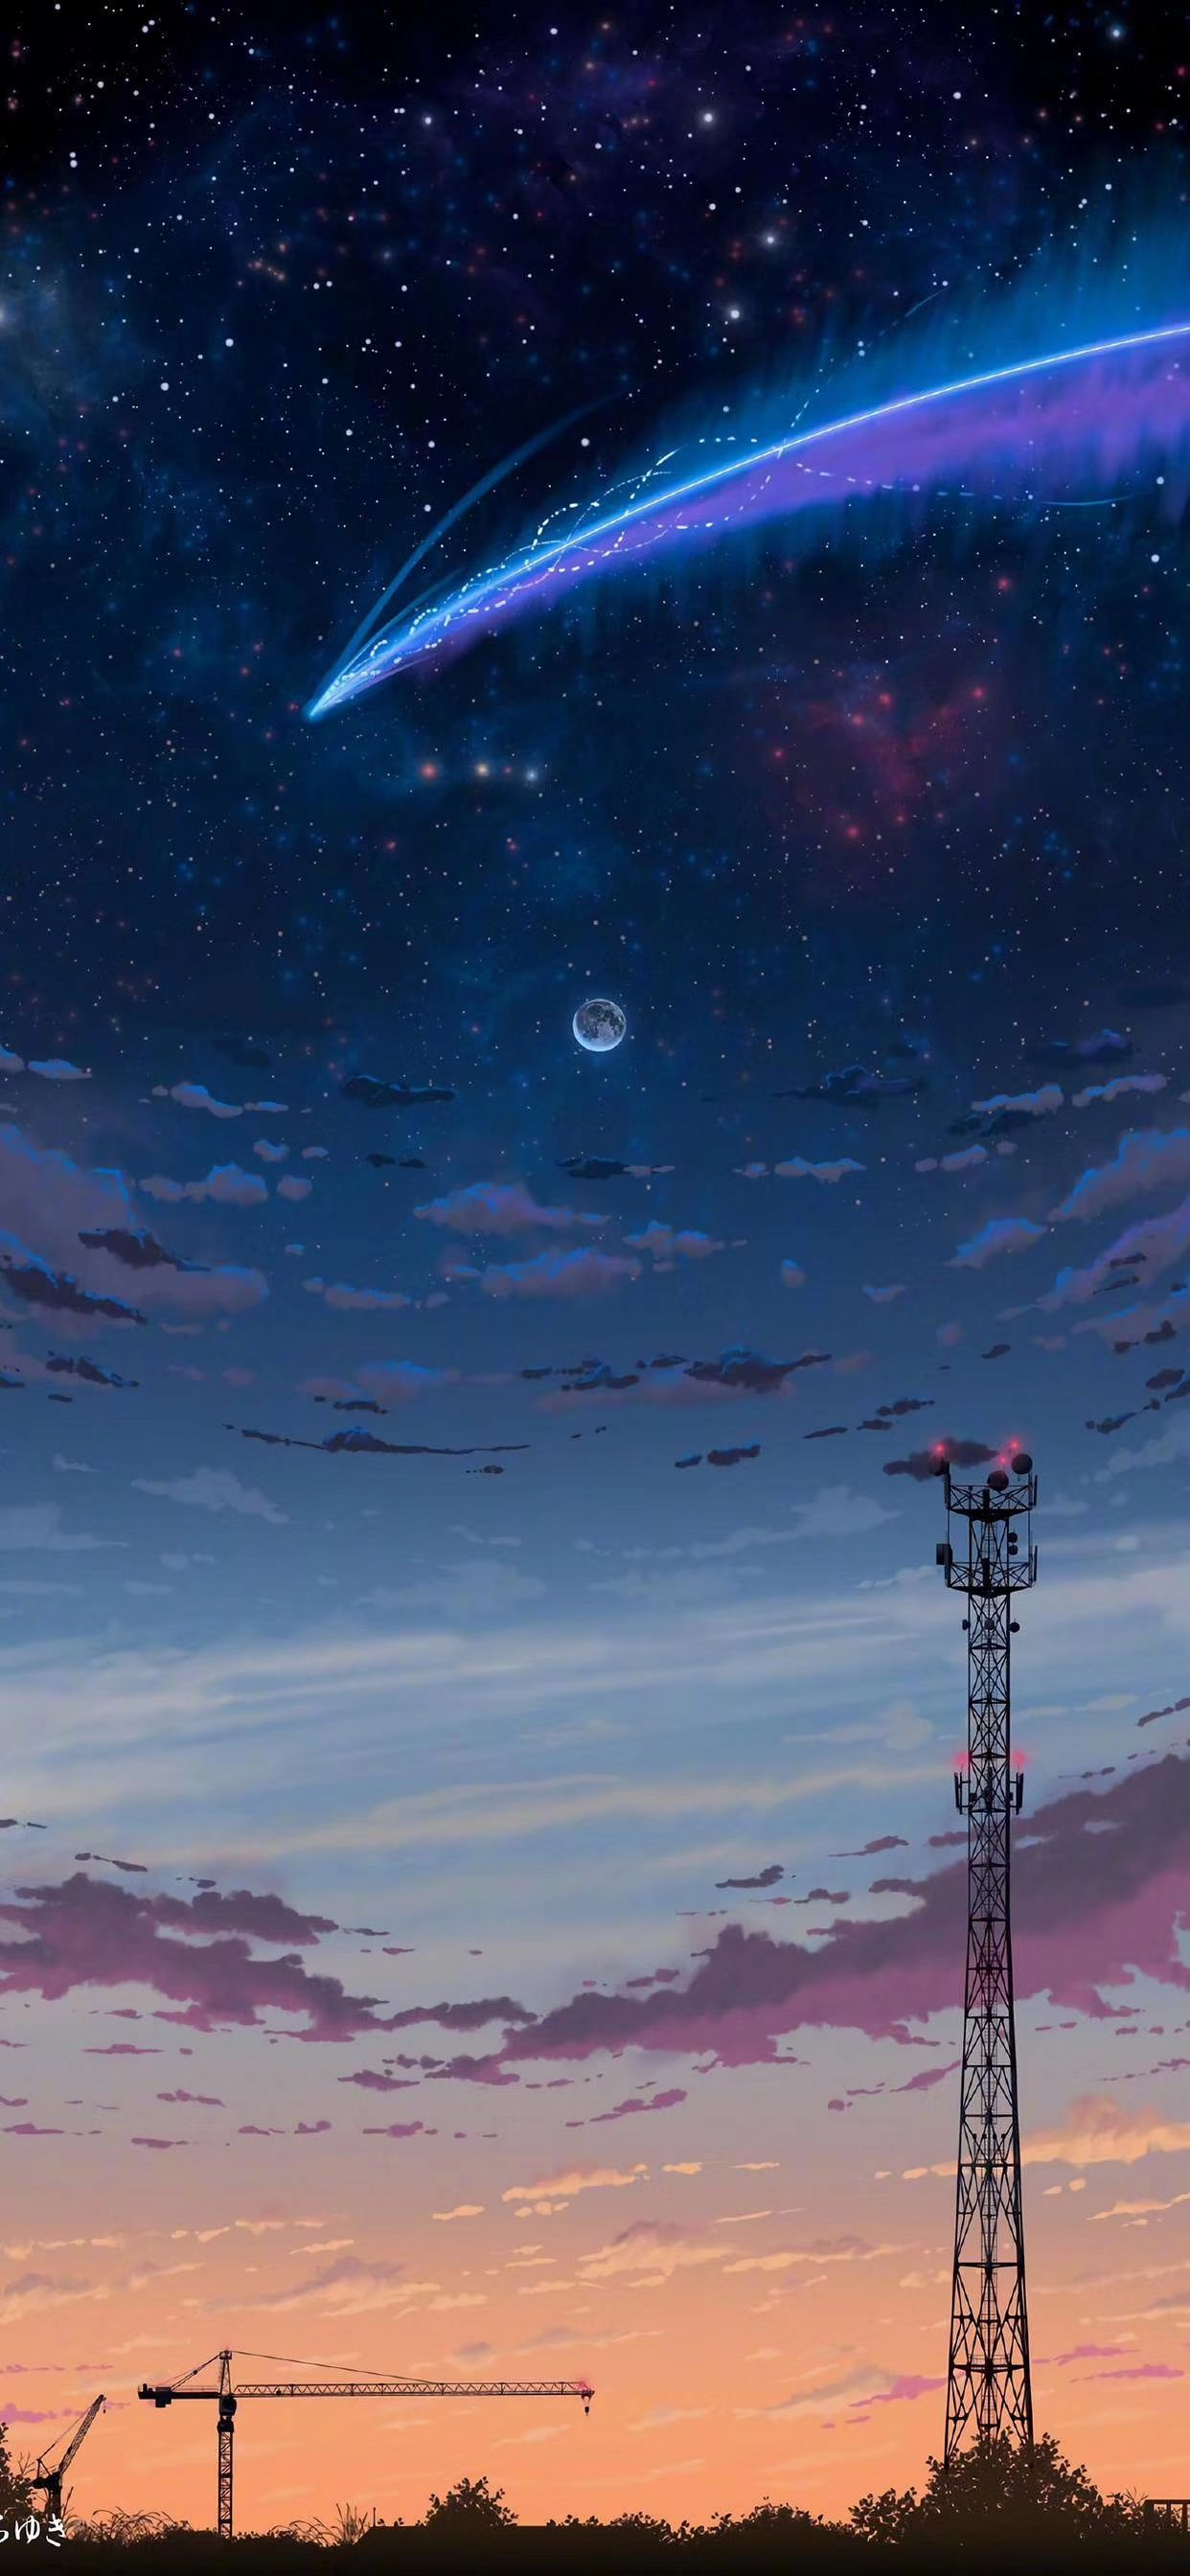 Fancy Wallpaper Pemandangan Anime Pemandangan Khayalan Fotografi Alam